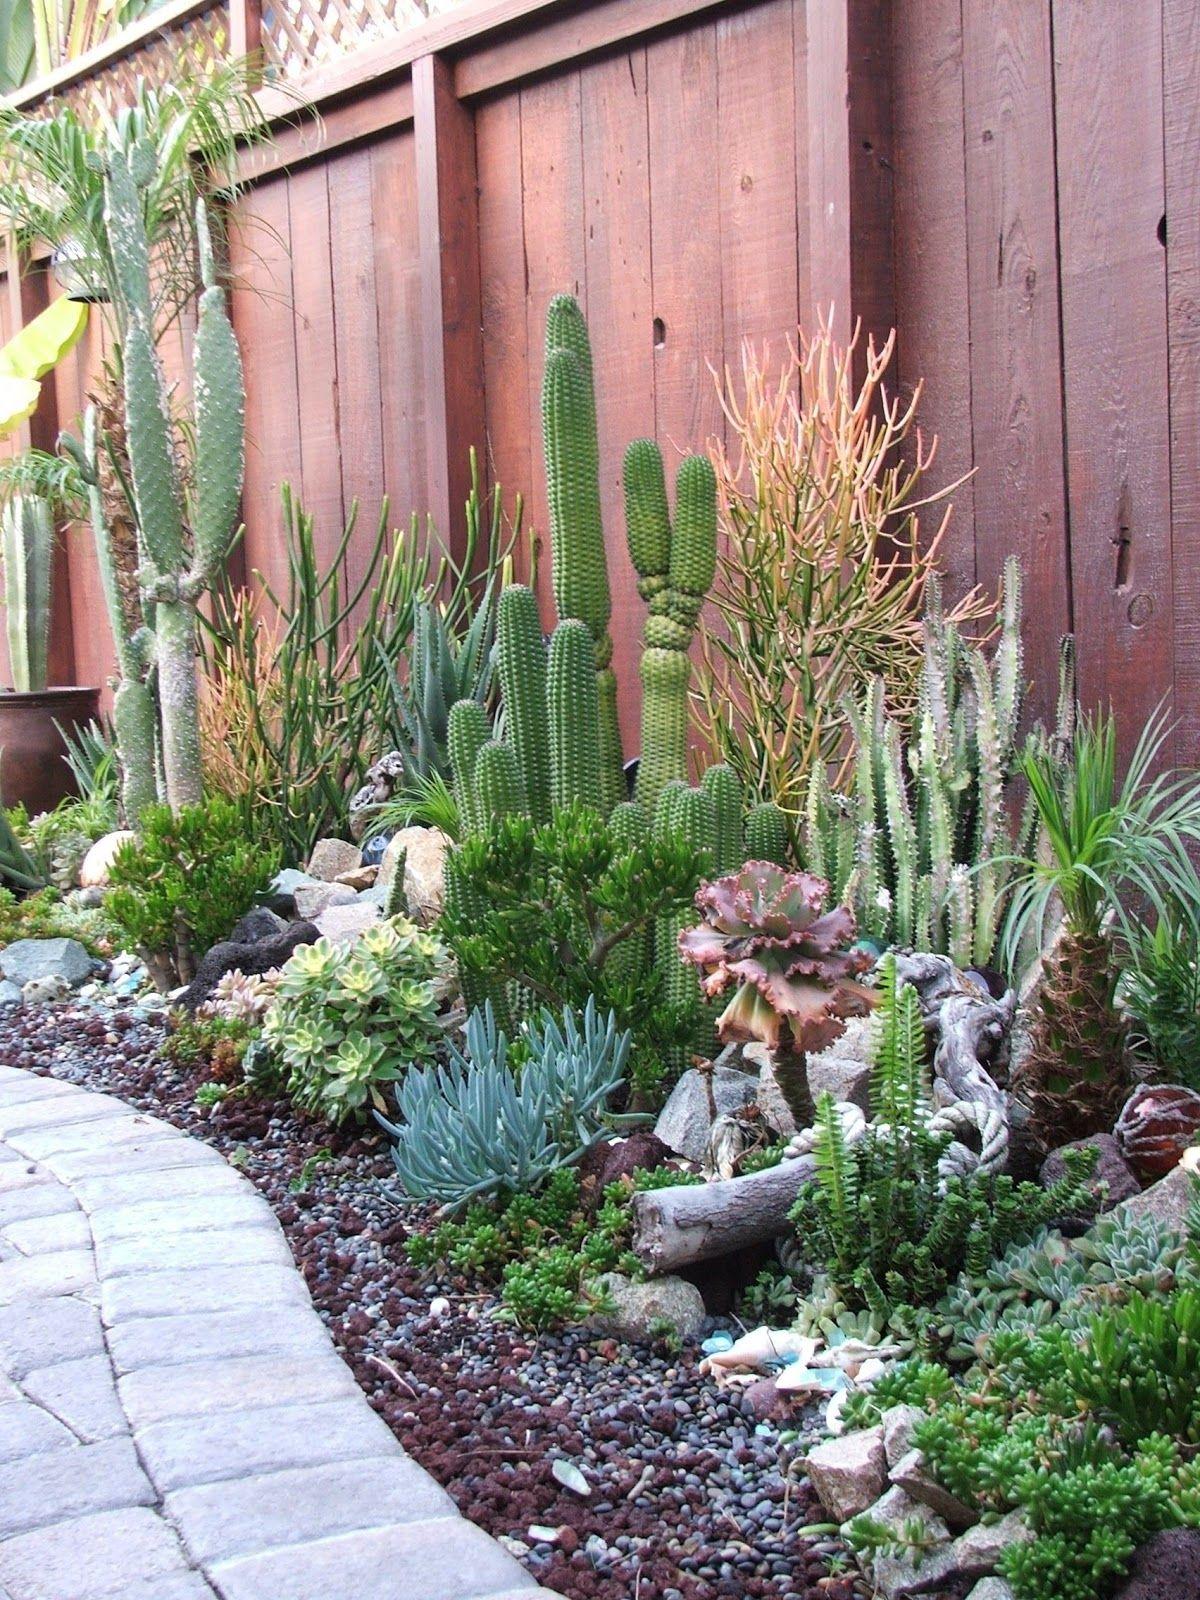 Here is a great succulent garden design